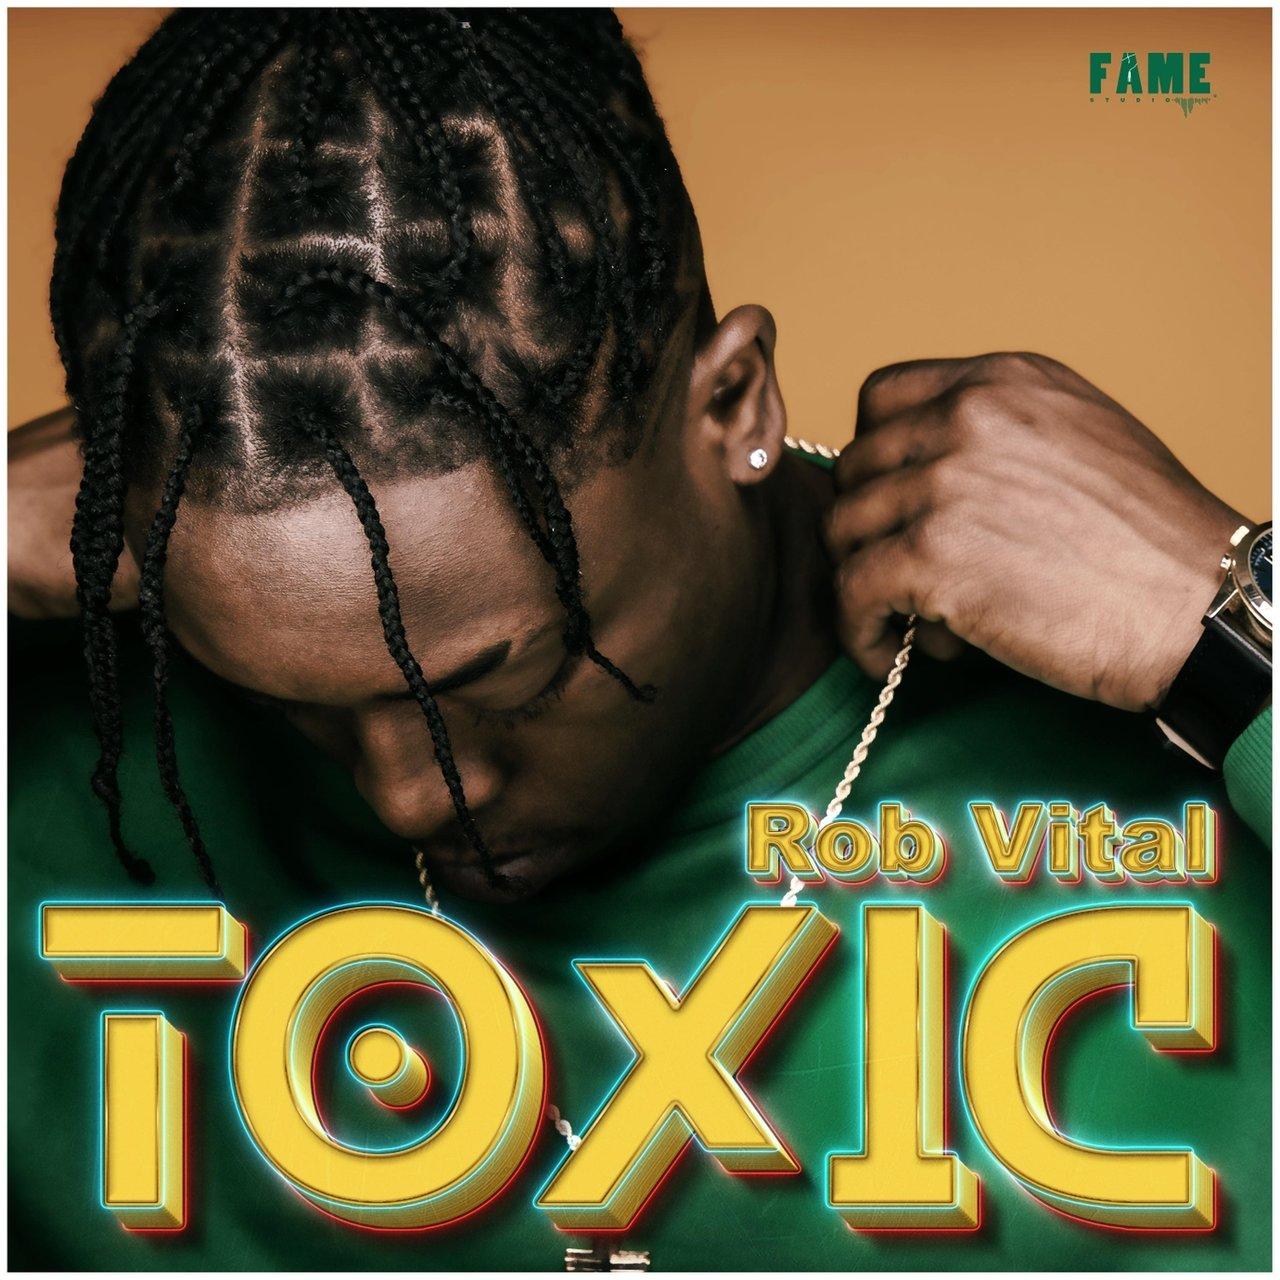 Rob Vital - Toxic (Cover)